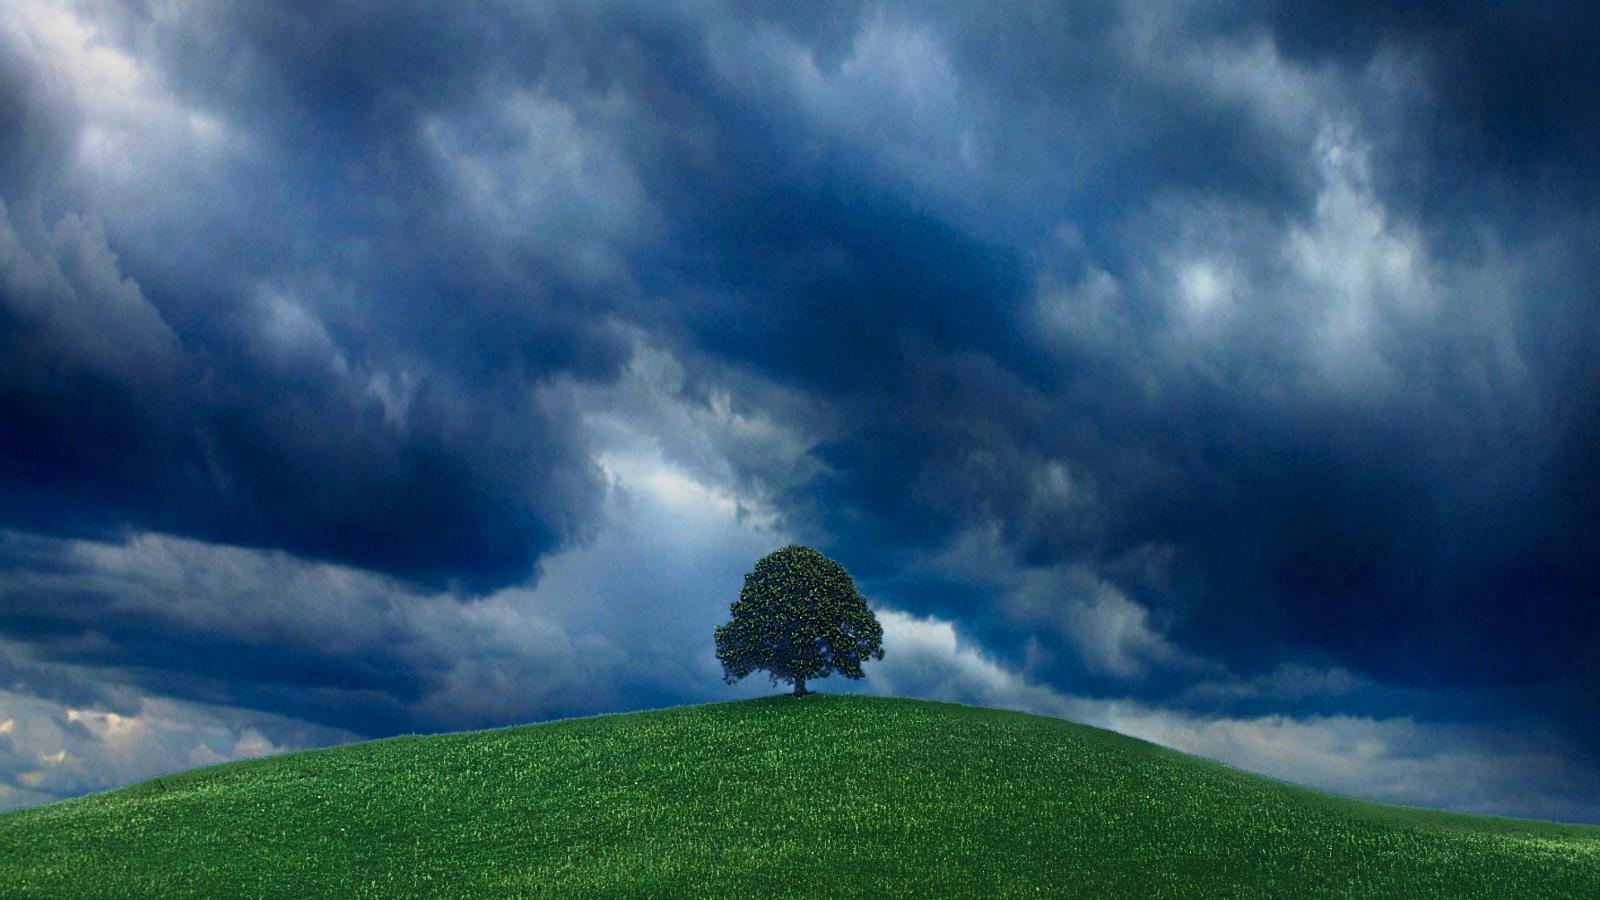 Download Wallpaper Before Thunderstorm (1600 x 900 ...